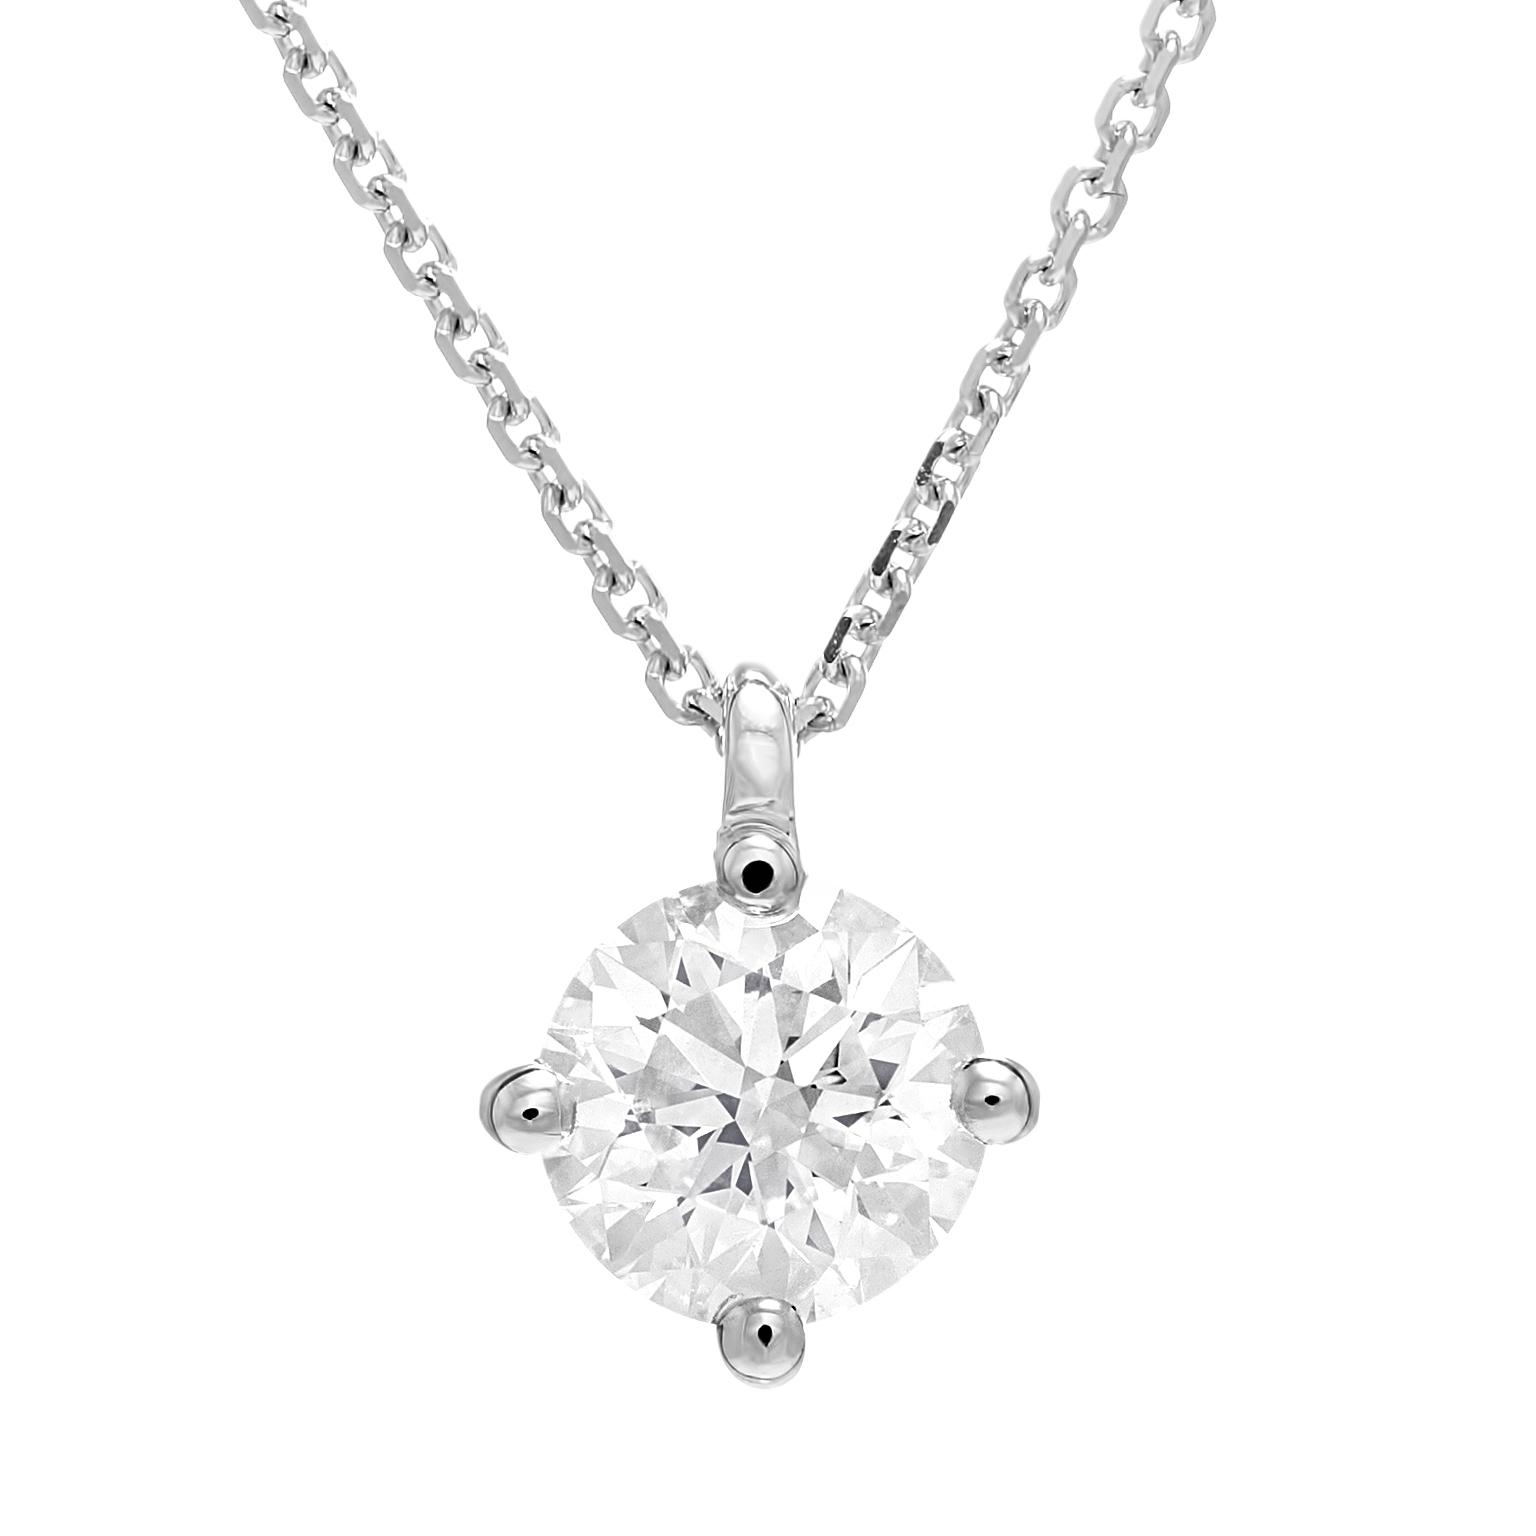 GIROCOLLO PUNTO LUCE, World Diamond Group